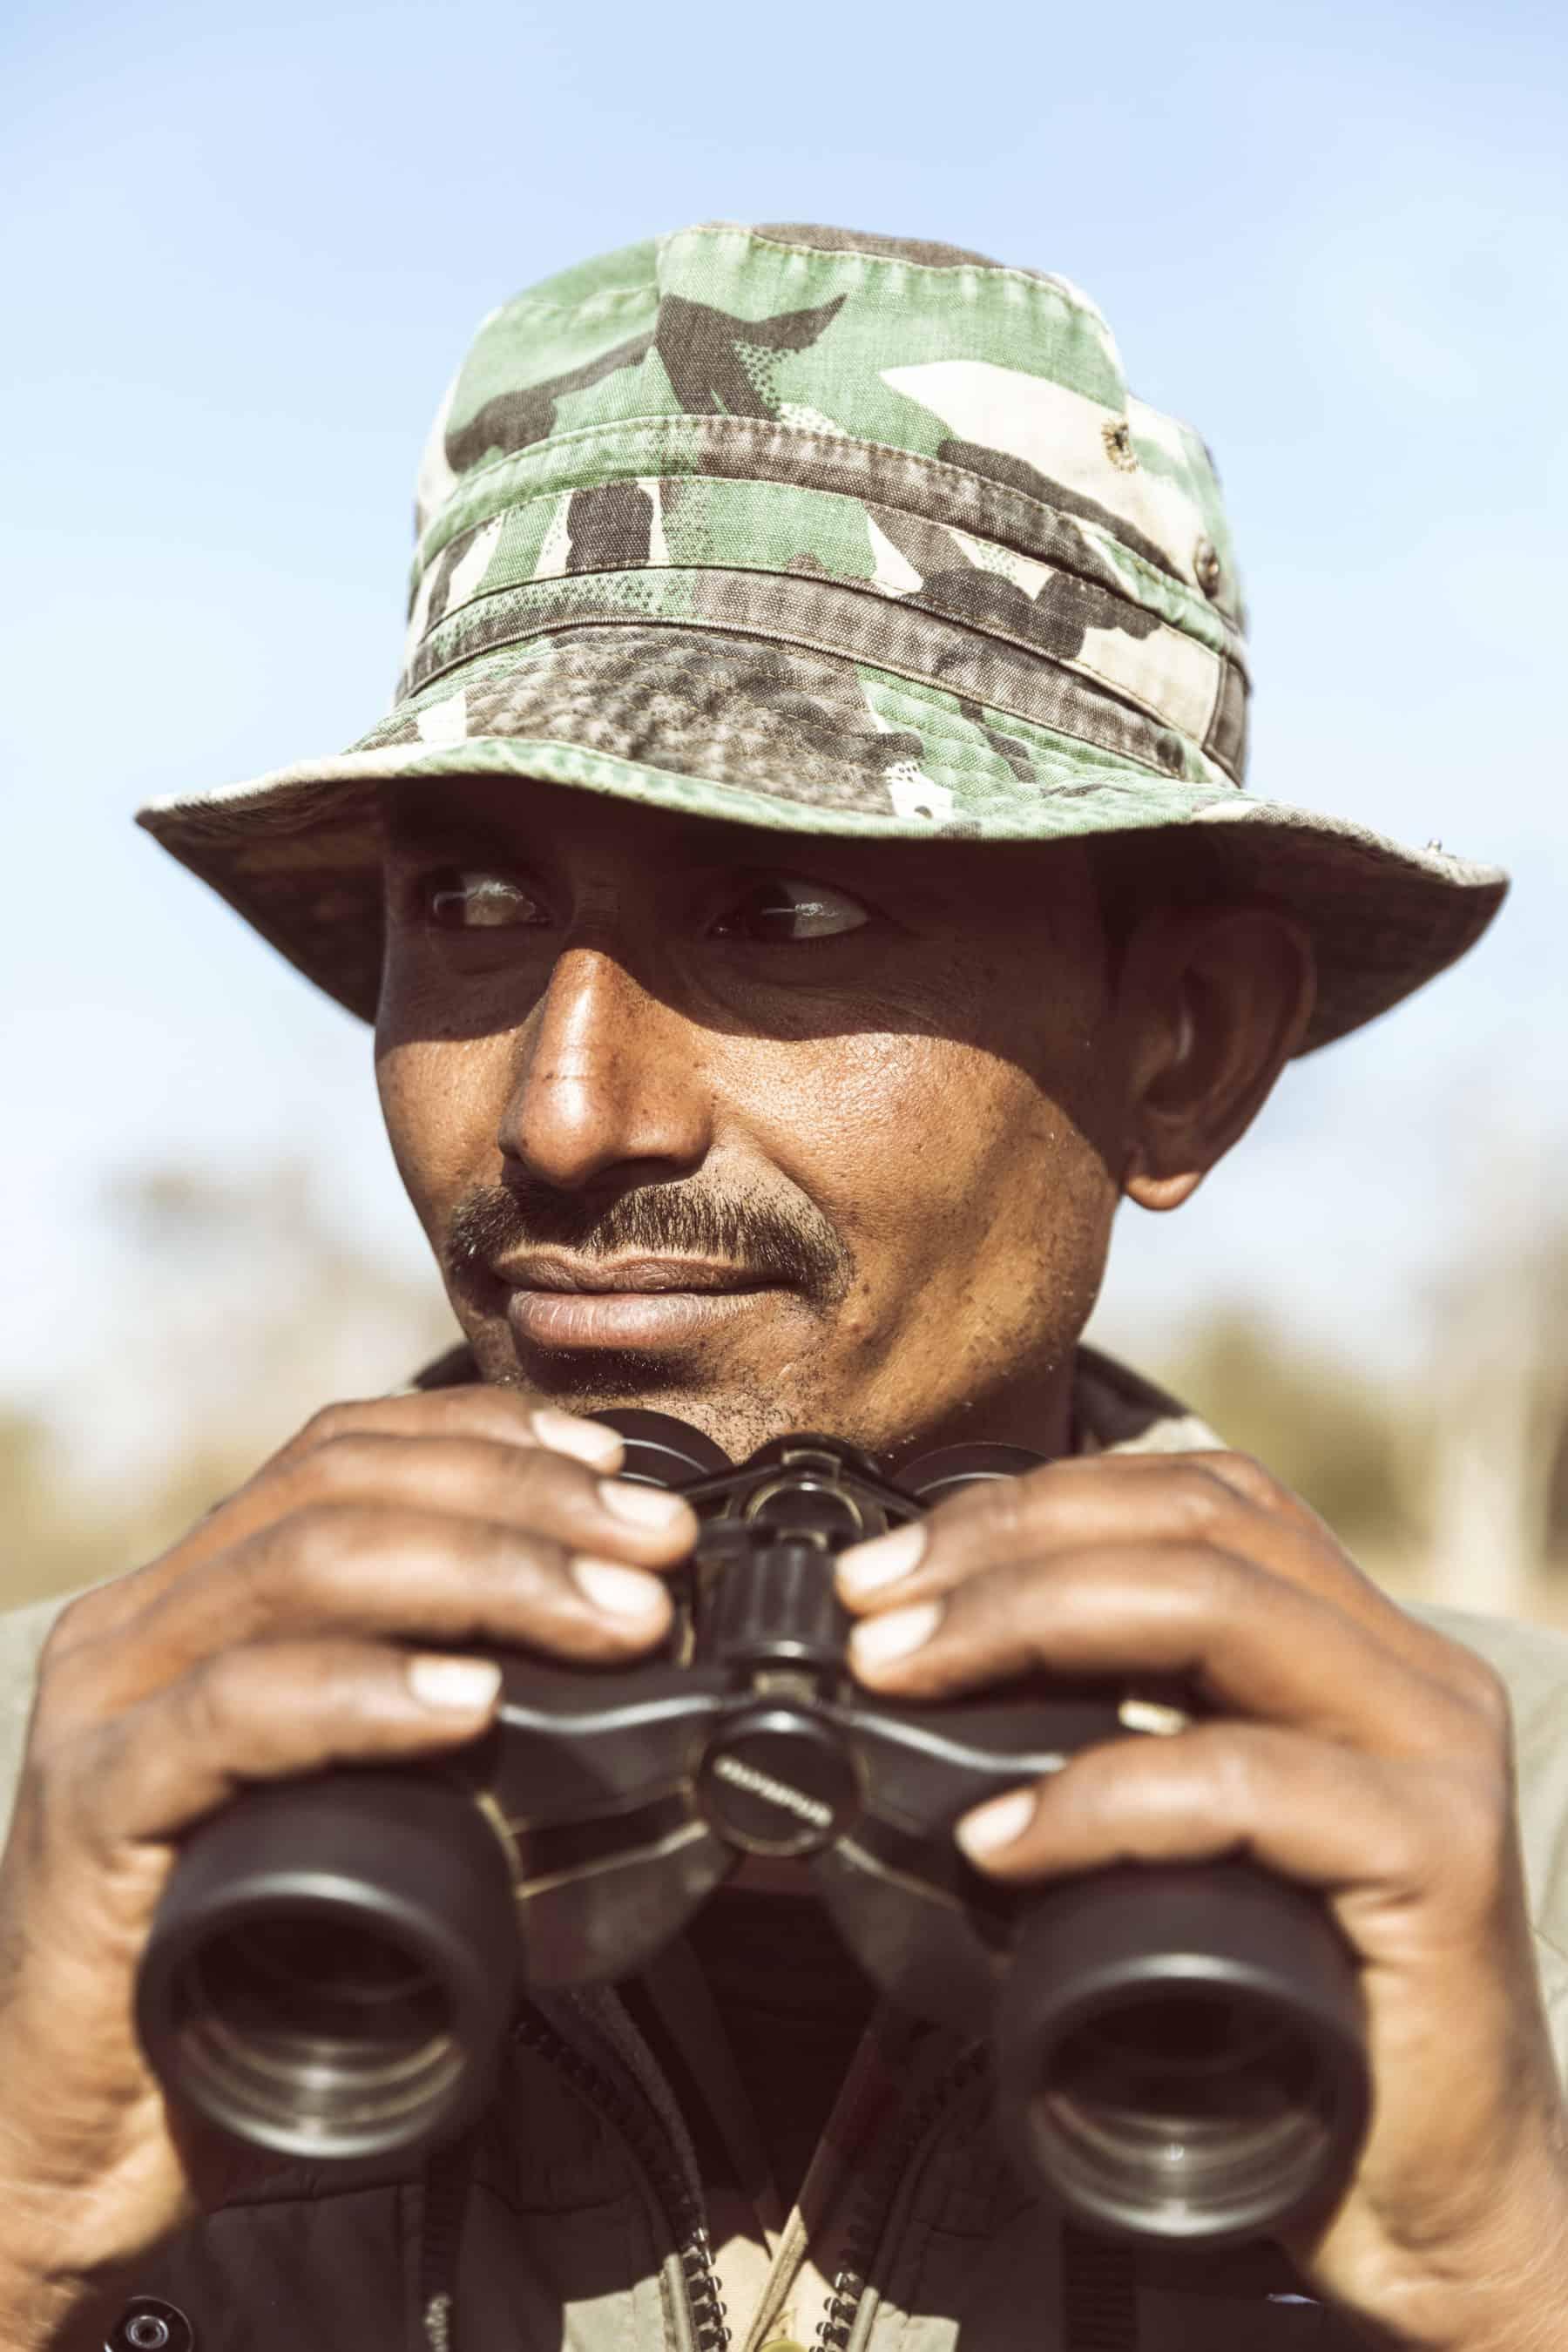 Naturalist on Safari in India